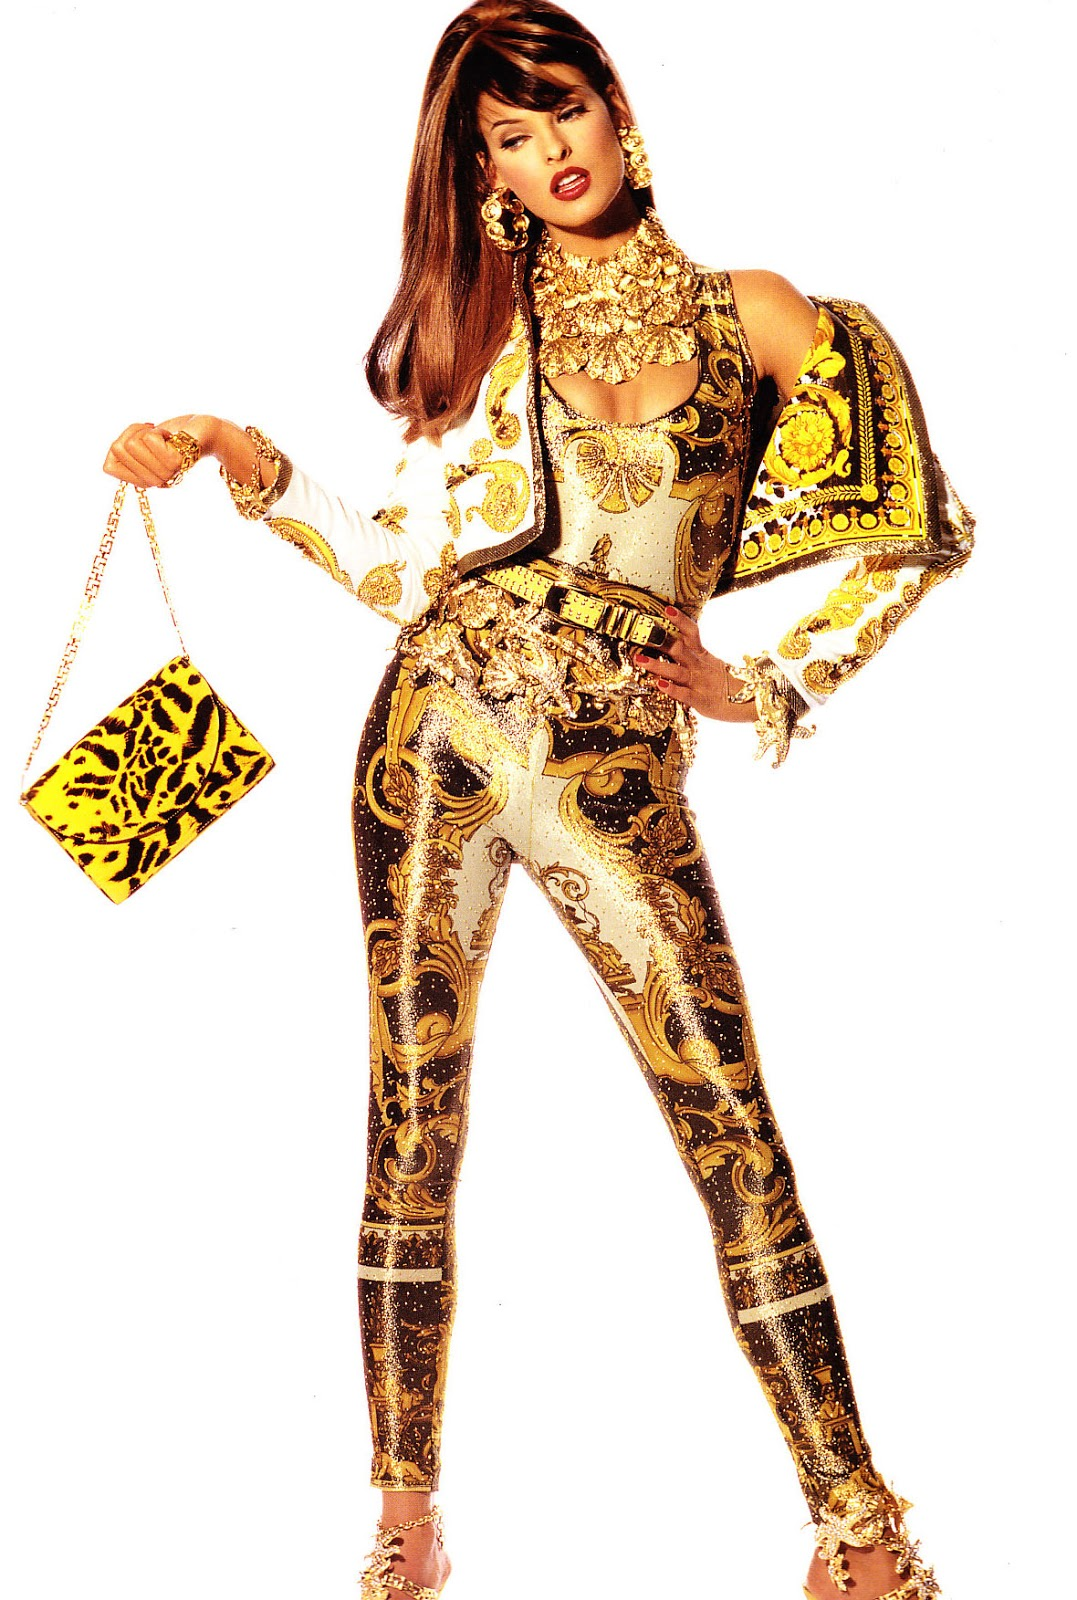 Linda Evangelista in Versace ad campaign